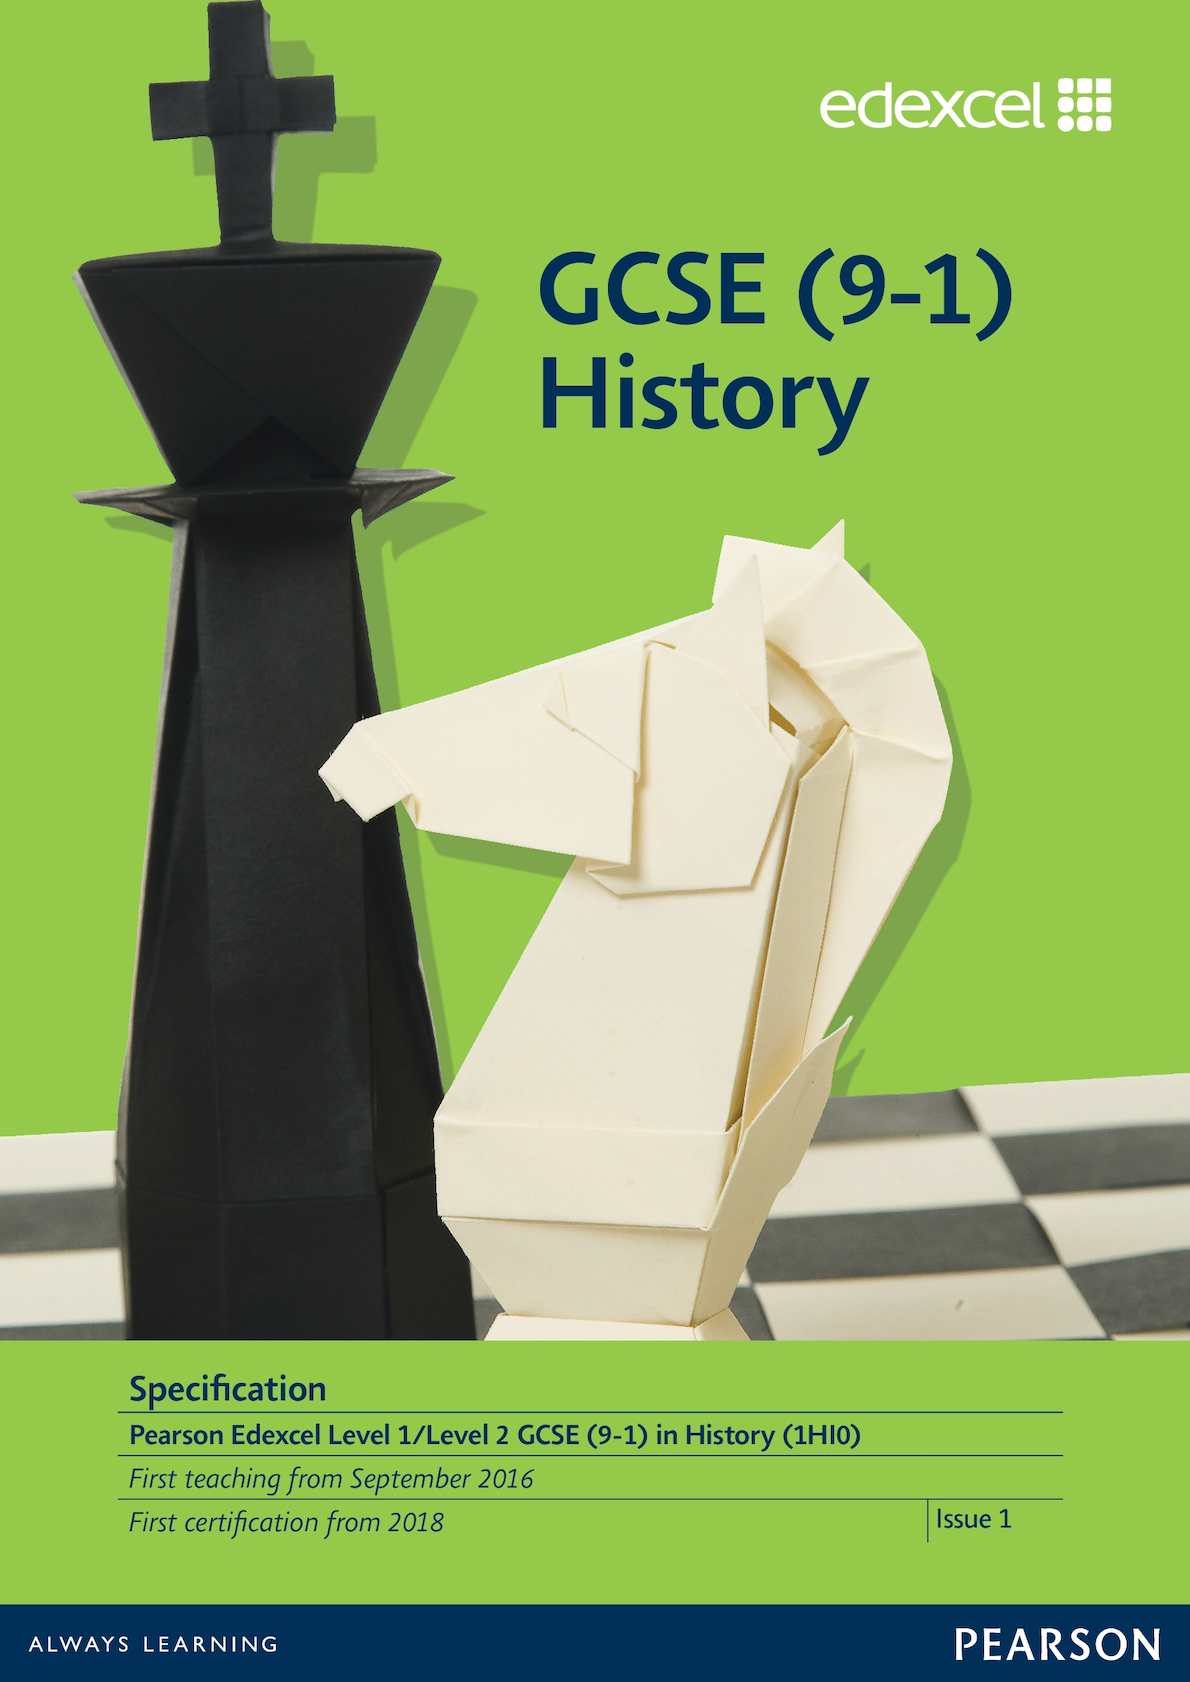 gcse history coursework 2009